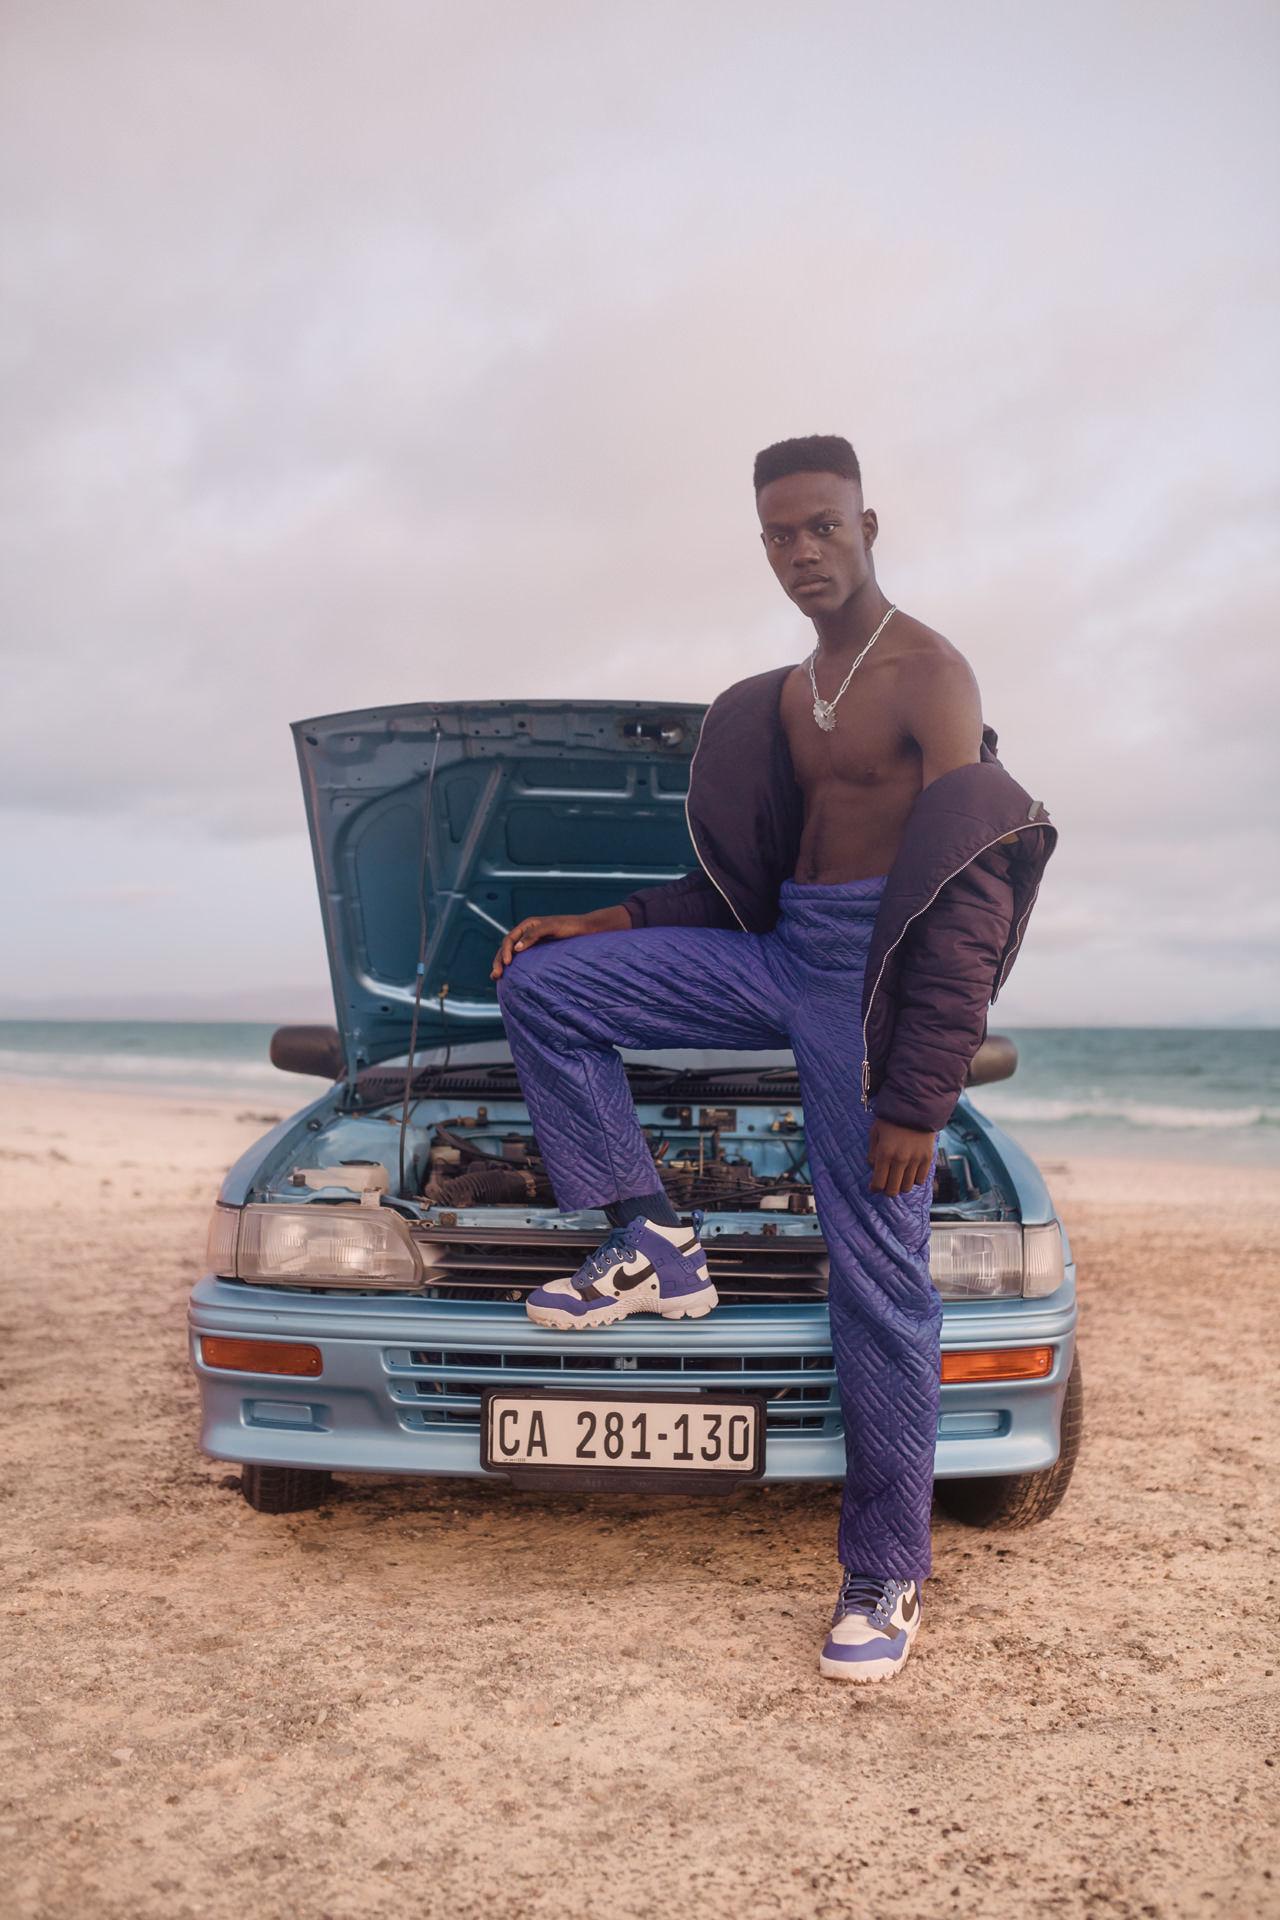 BAM Photographers, BEN & MARTIN : HOCKE - A photography exhibition from Muizenberg South Africa